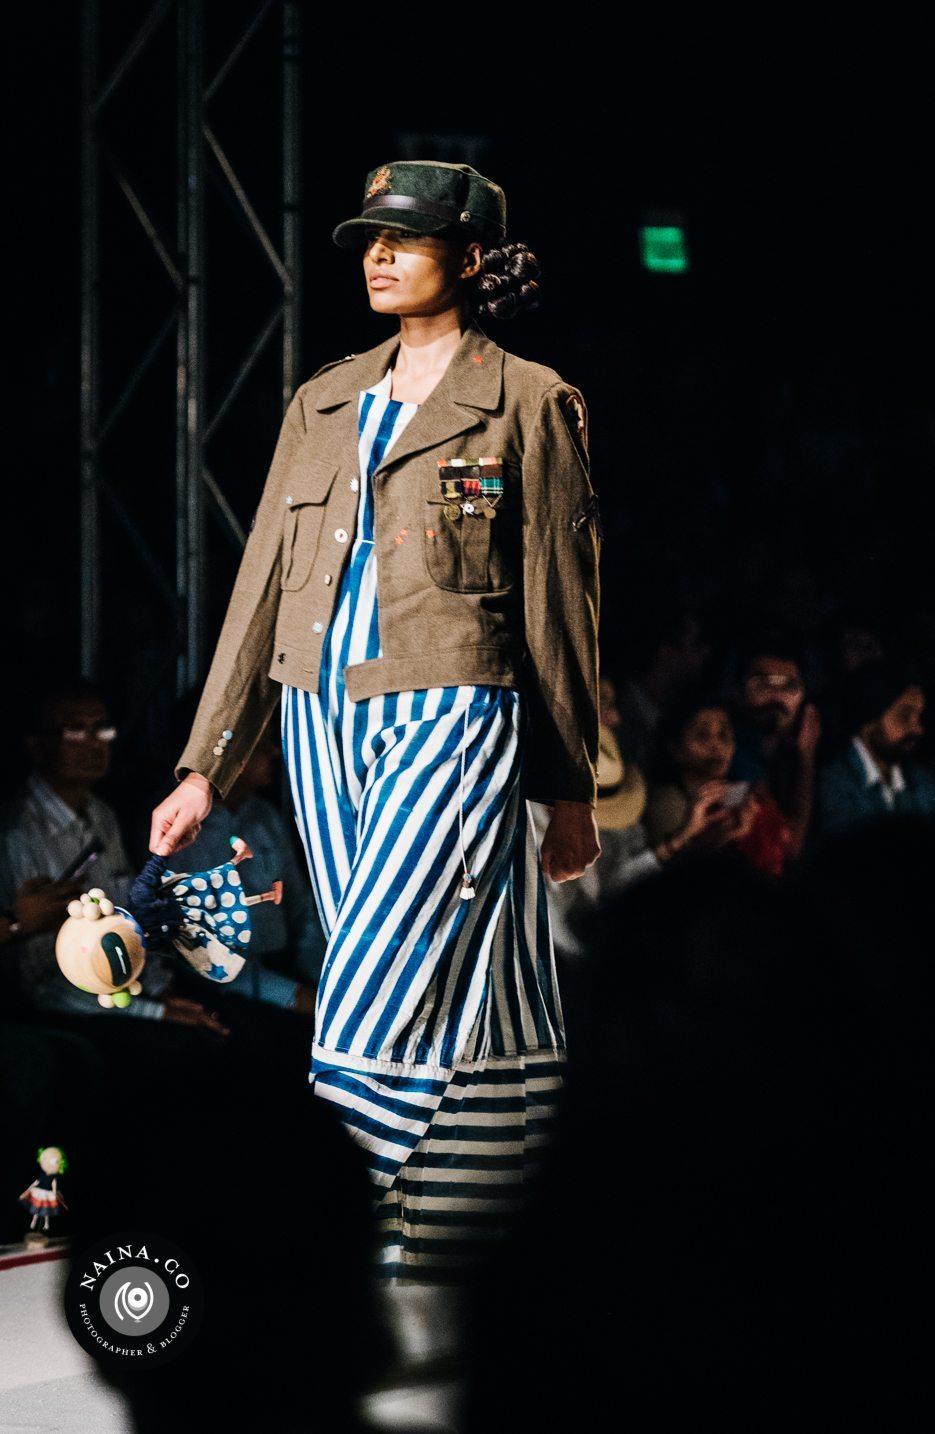 Naina.co-Raconteuse-Visuelle-Photographer-Blogger-Storyteller-Luxury-Lifestyle-AIFWAW15-Pero